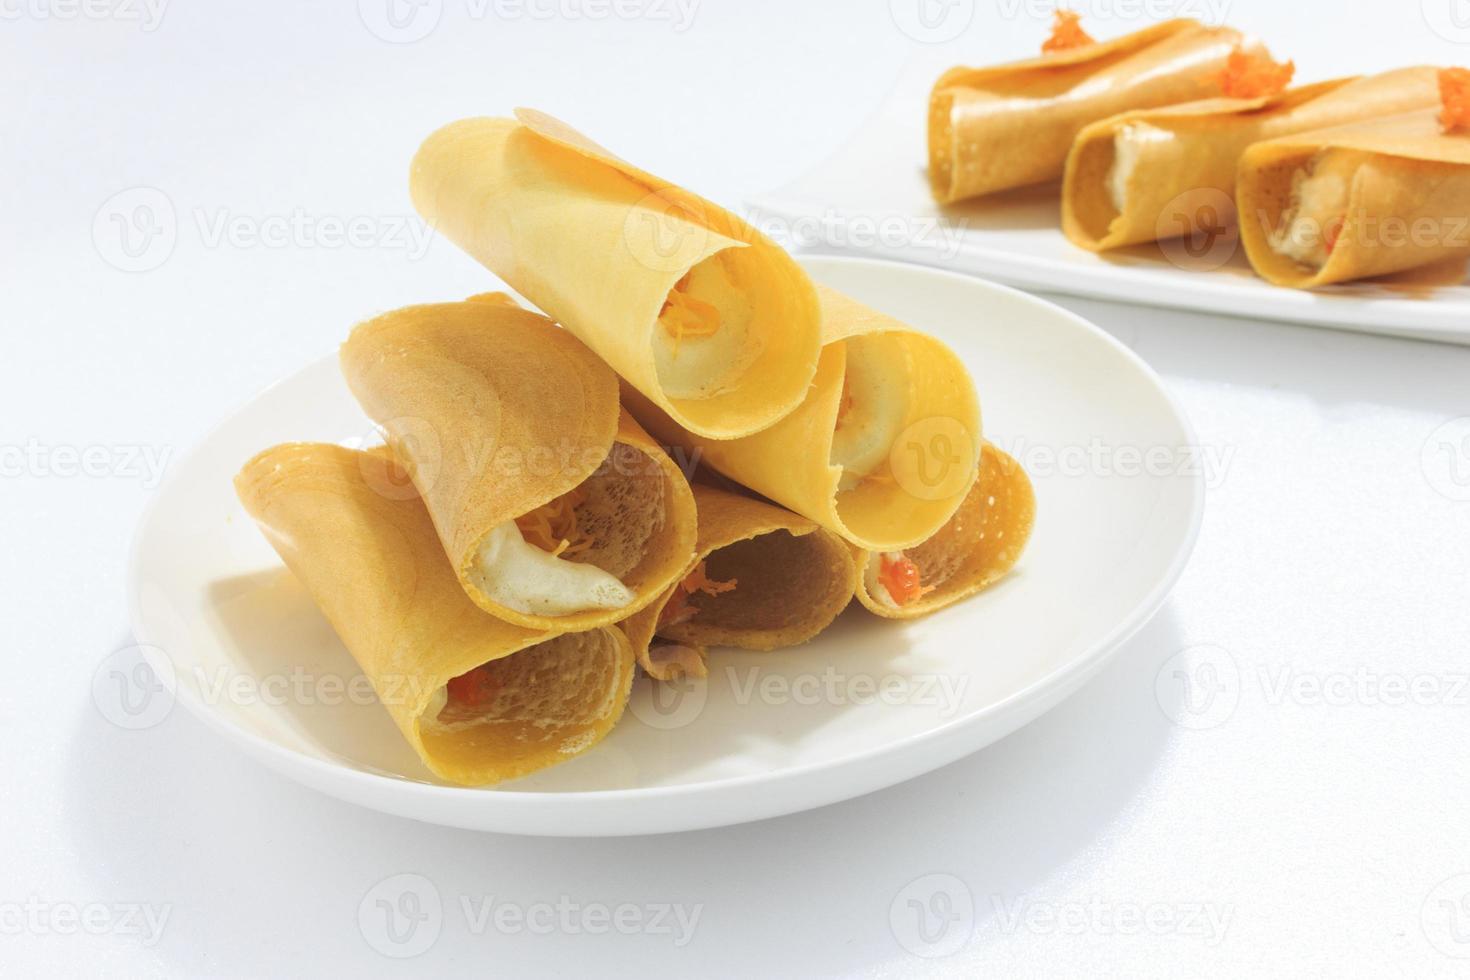 Thaise knapperige pannenkoek, Thais dessert foto